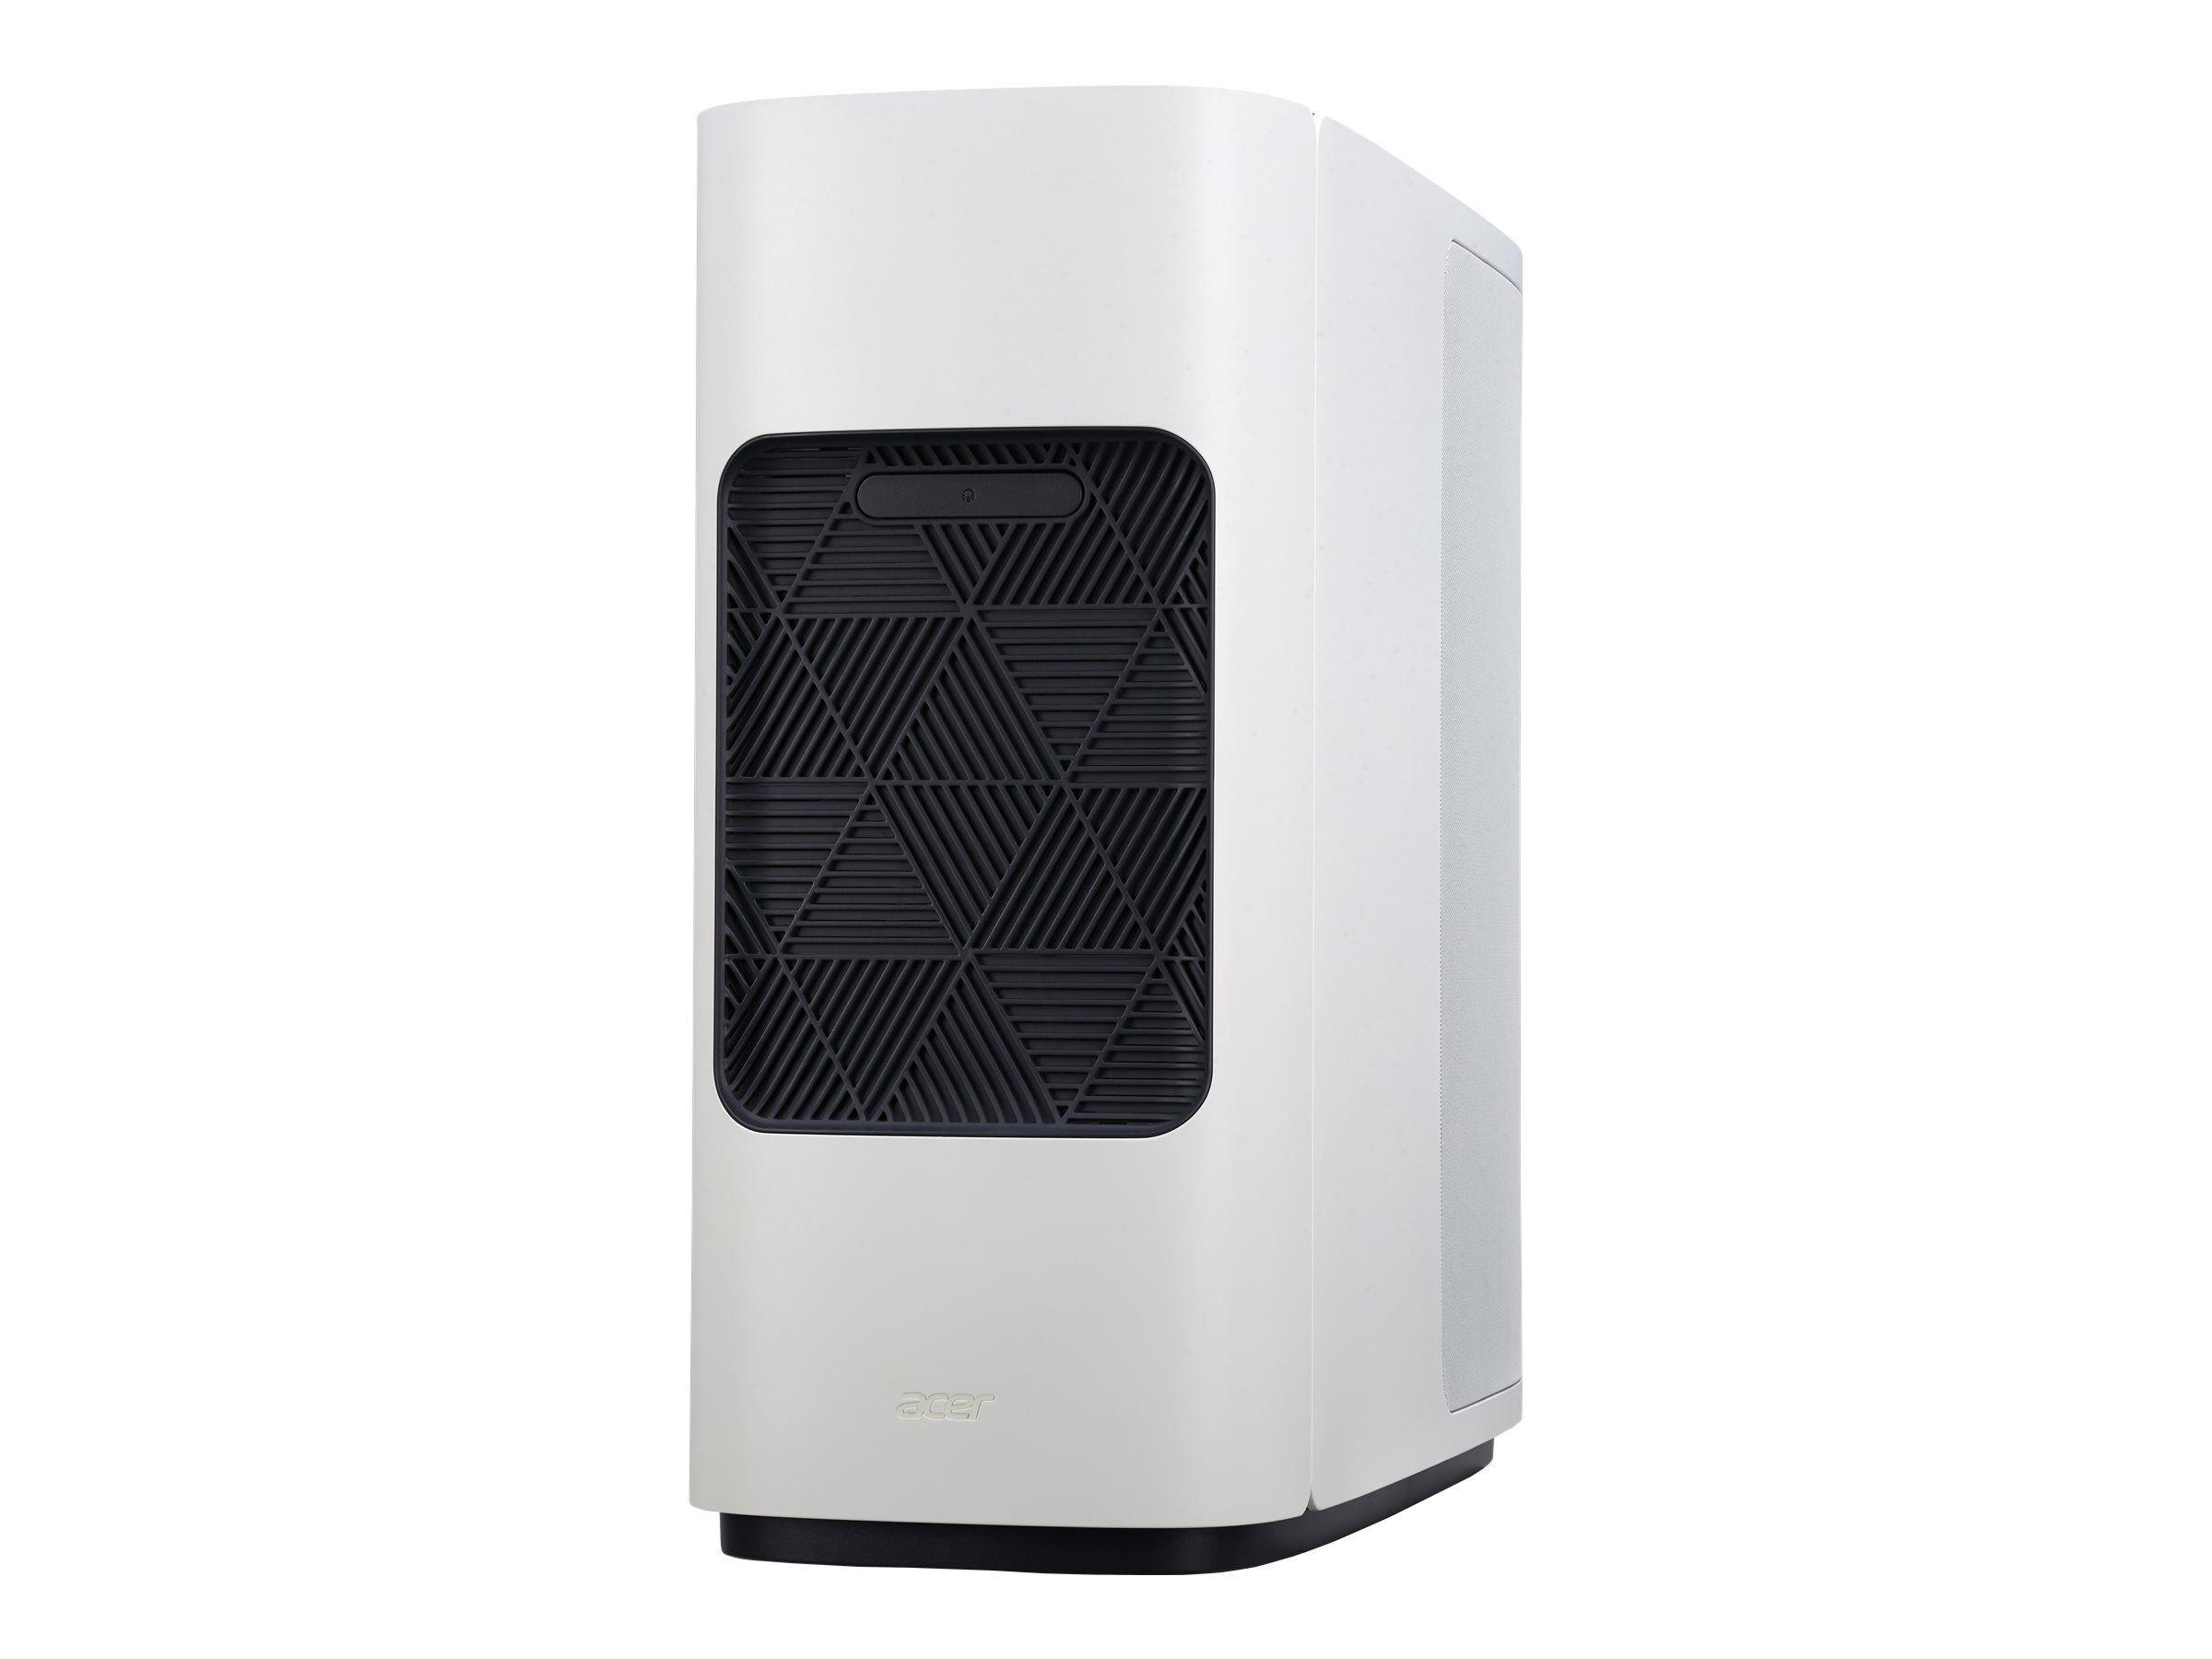 Acer ConceptD 500 CT500-51A - MDT - Core i7 9700K / 3.6 GHz - RAM 16 Go - SSD 512 Go, HDD 1 To - Quadro P2200 - GigE, 802.11ac Wave 2 - LAN sans fil: 802.11a/b/g/n/ac Wave 2, Bluetooth 5.0 - Win 10 Pro 64 bits - moniteur : aucun